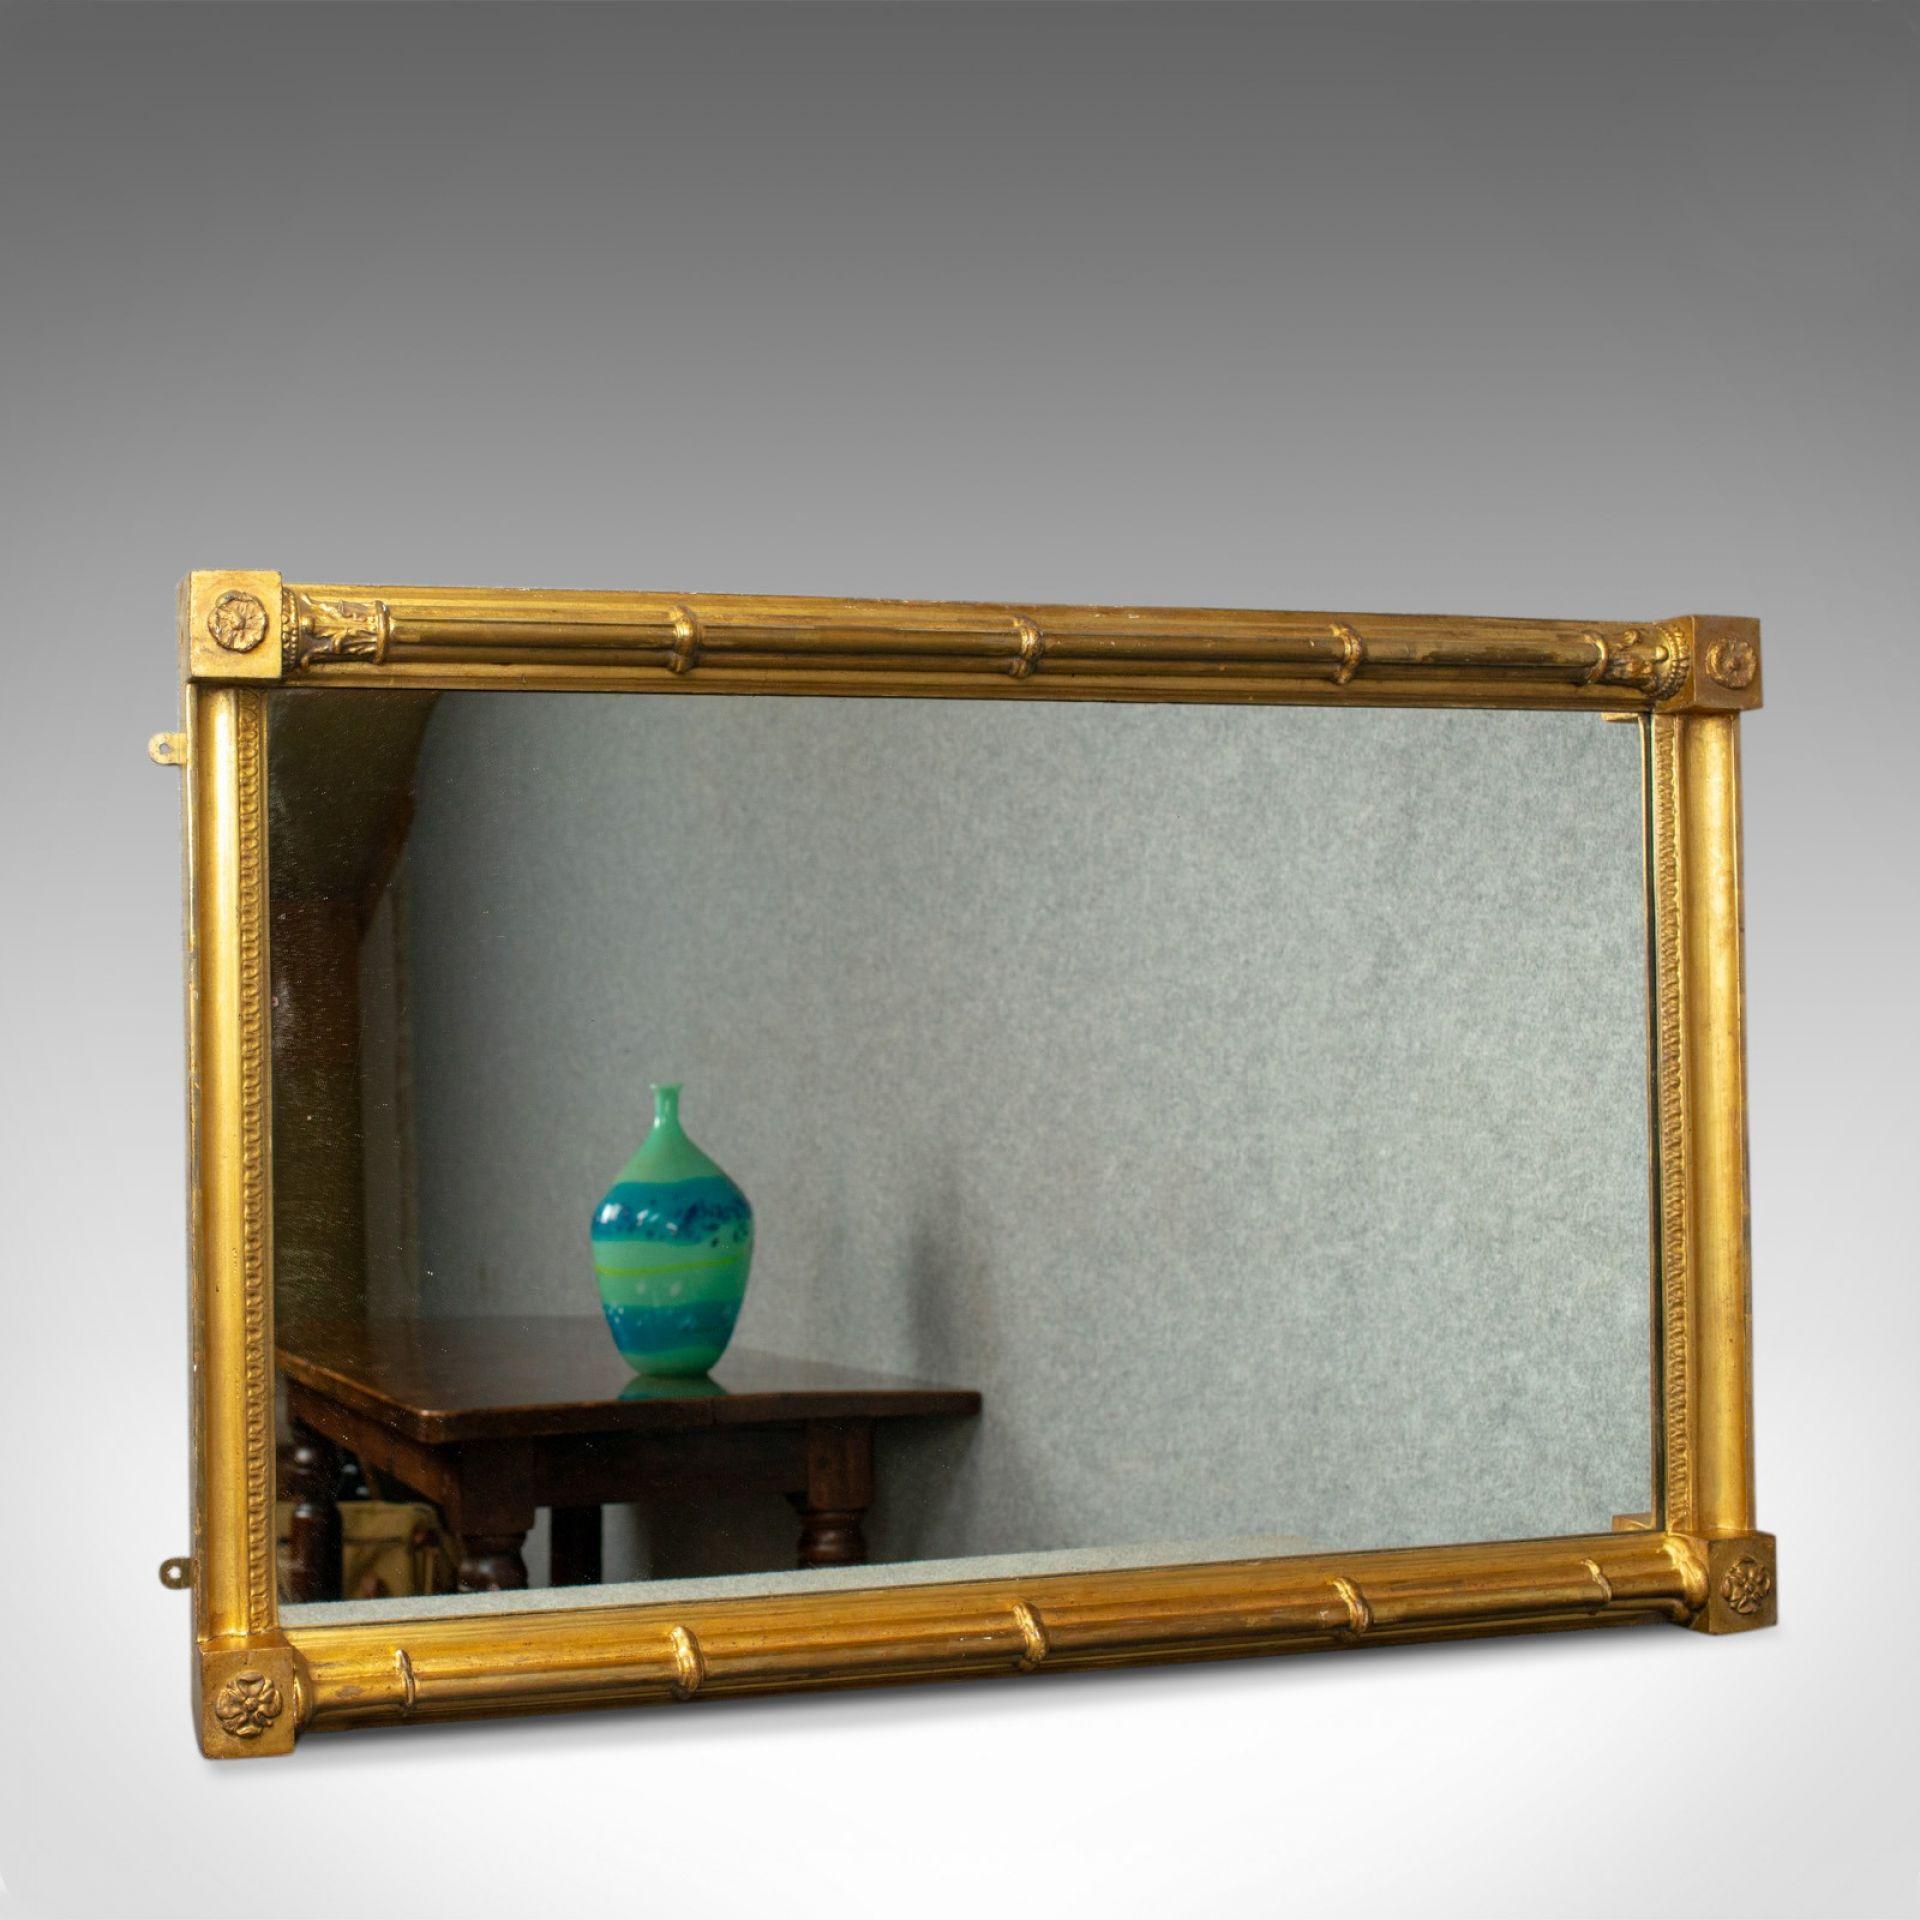 Antique Wall Mirror, English, Georgian, Giltwood, Console, Circa 1800